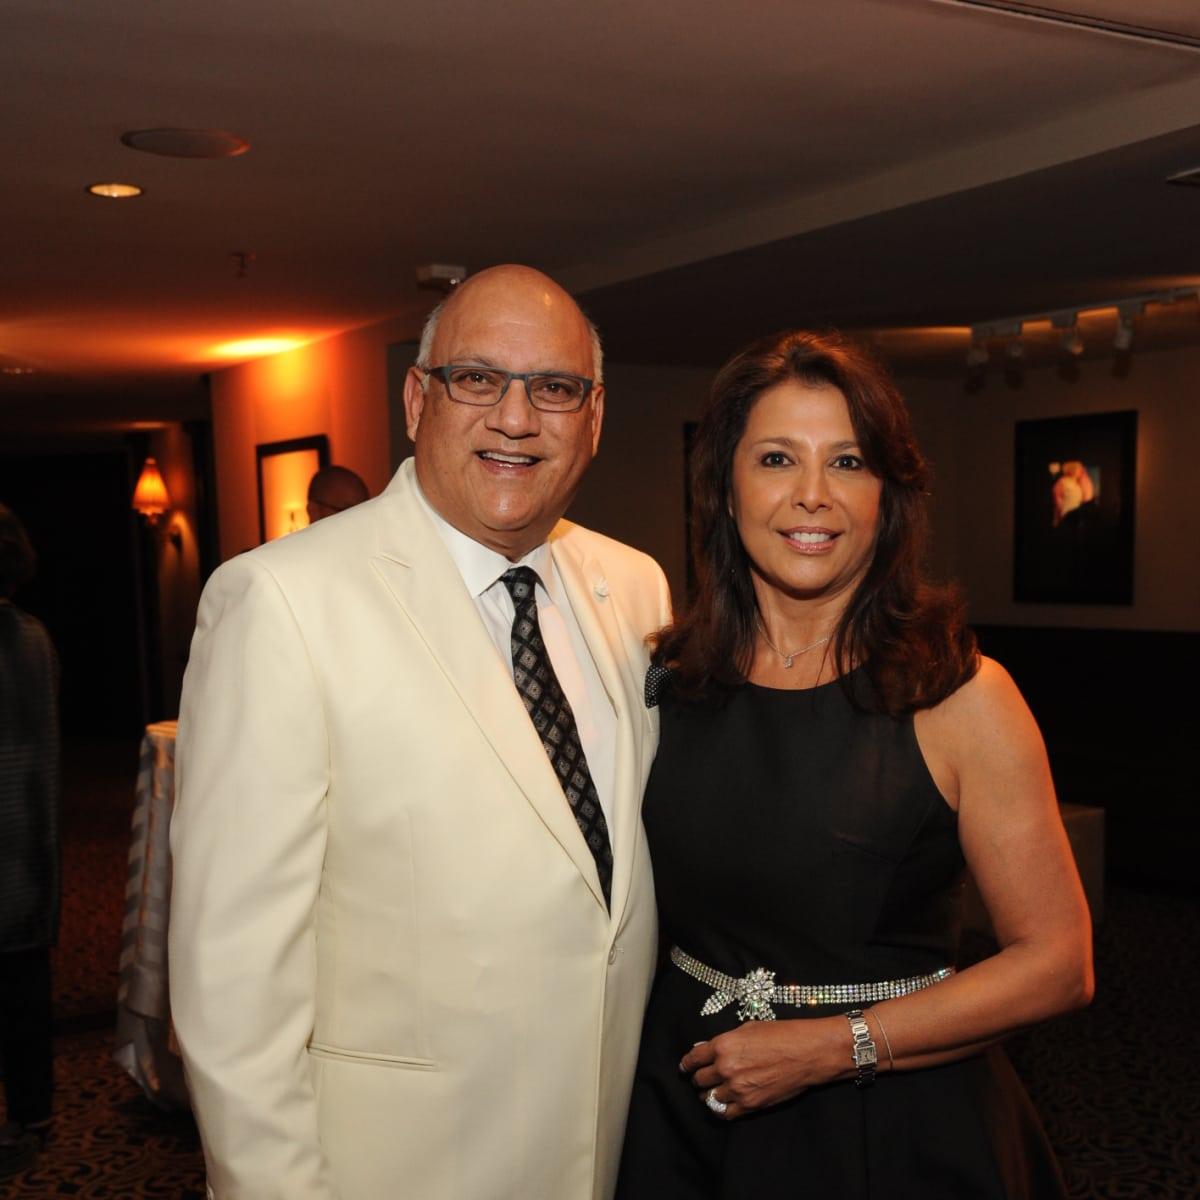 Houston Arts Alliance dinner 5/16, Dr. Fred Aguilar, Regina Garcia